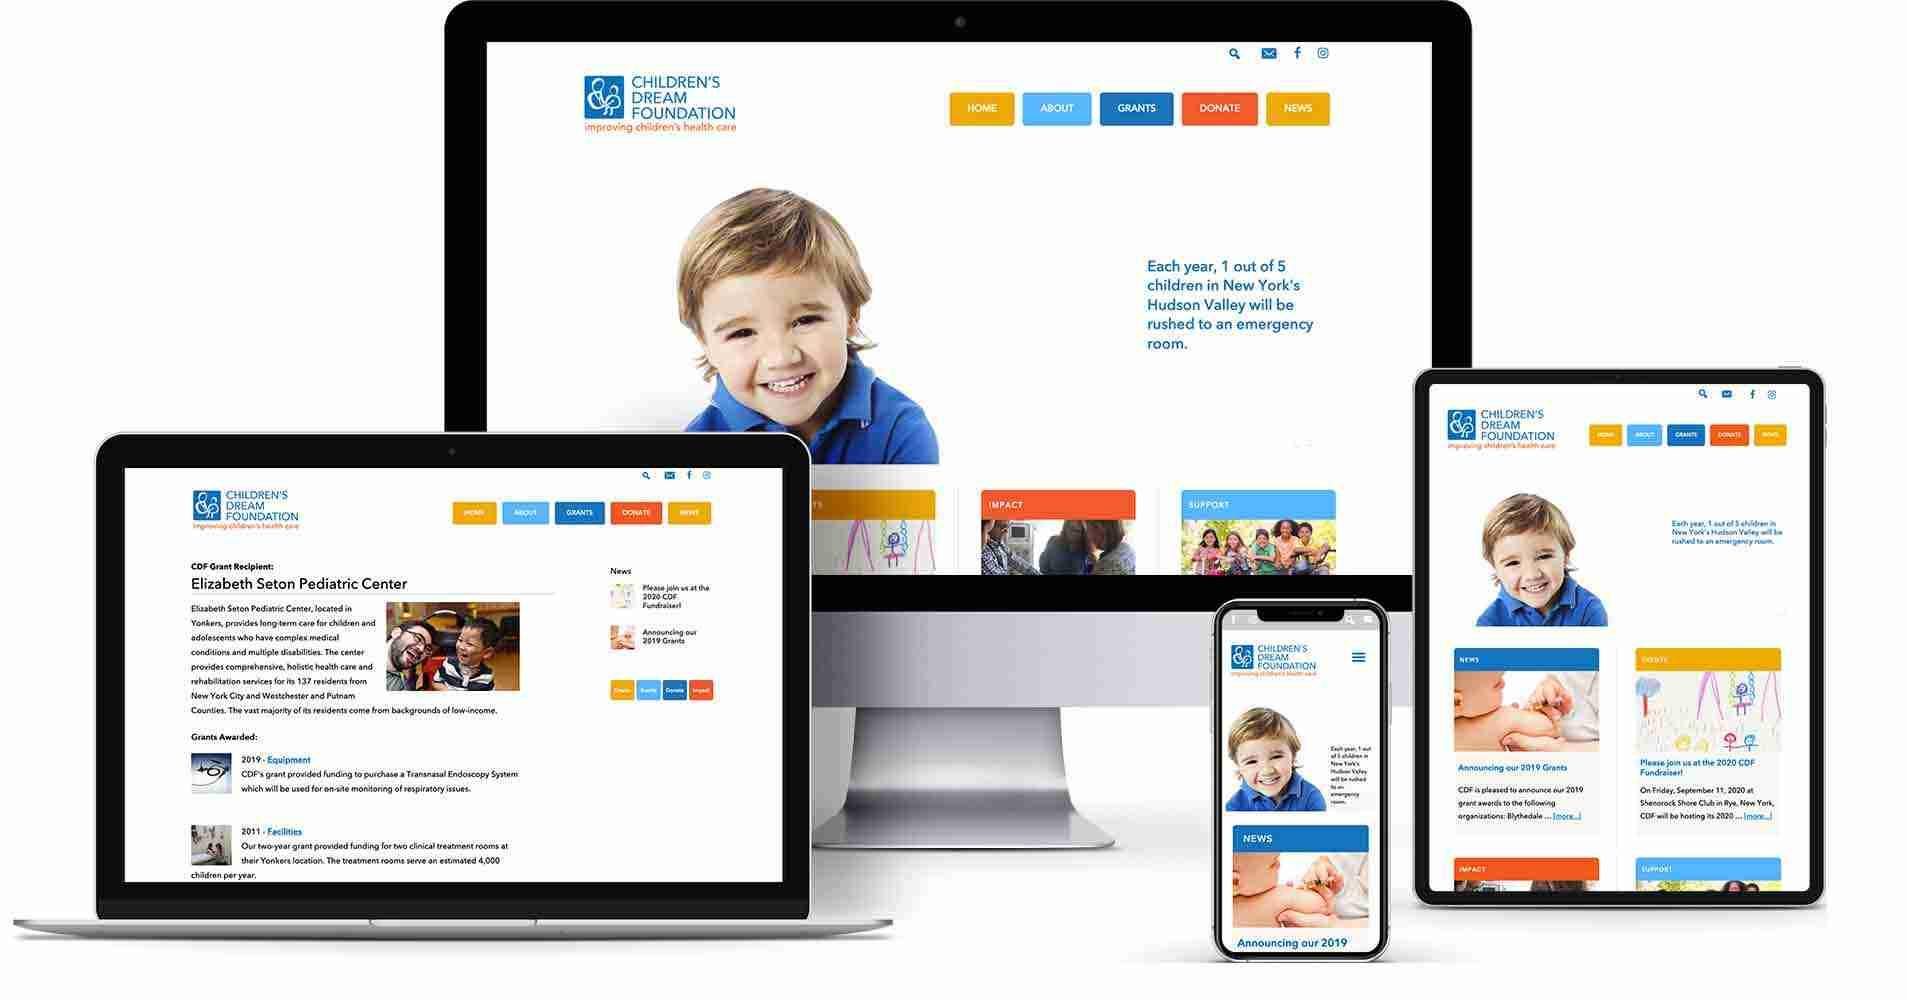 Non-profit website - The Children's Dream Foundation